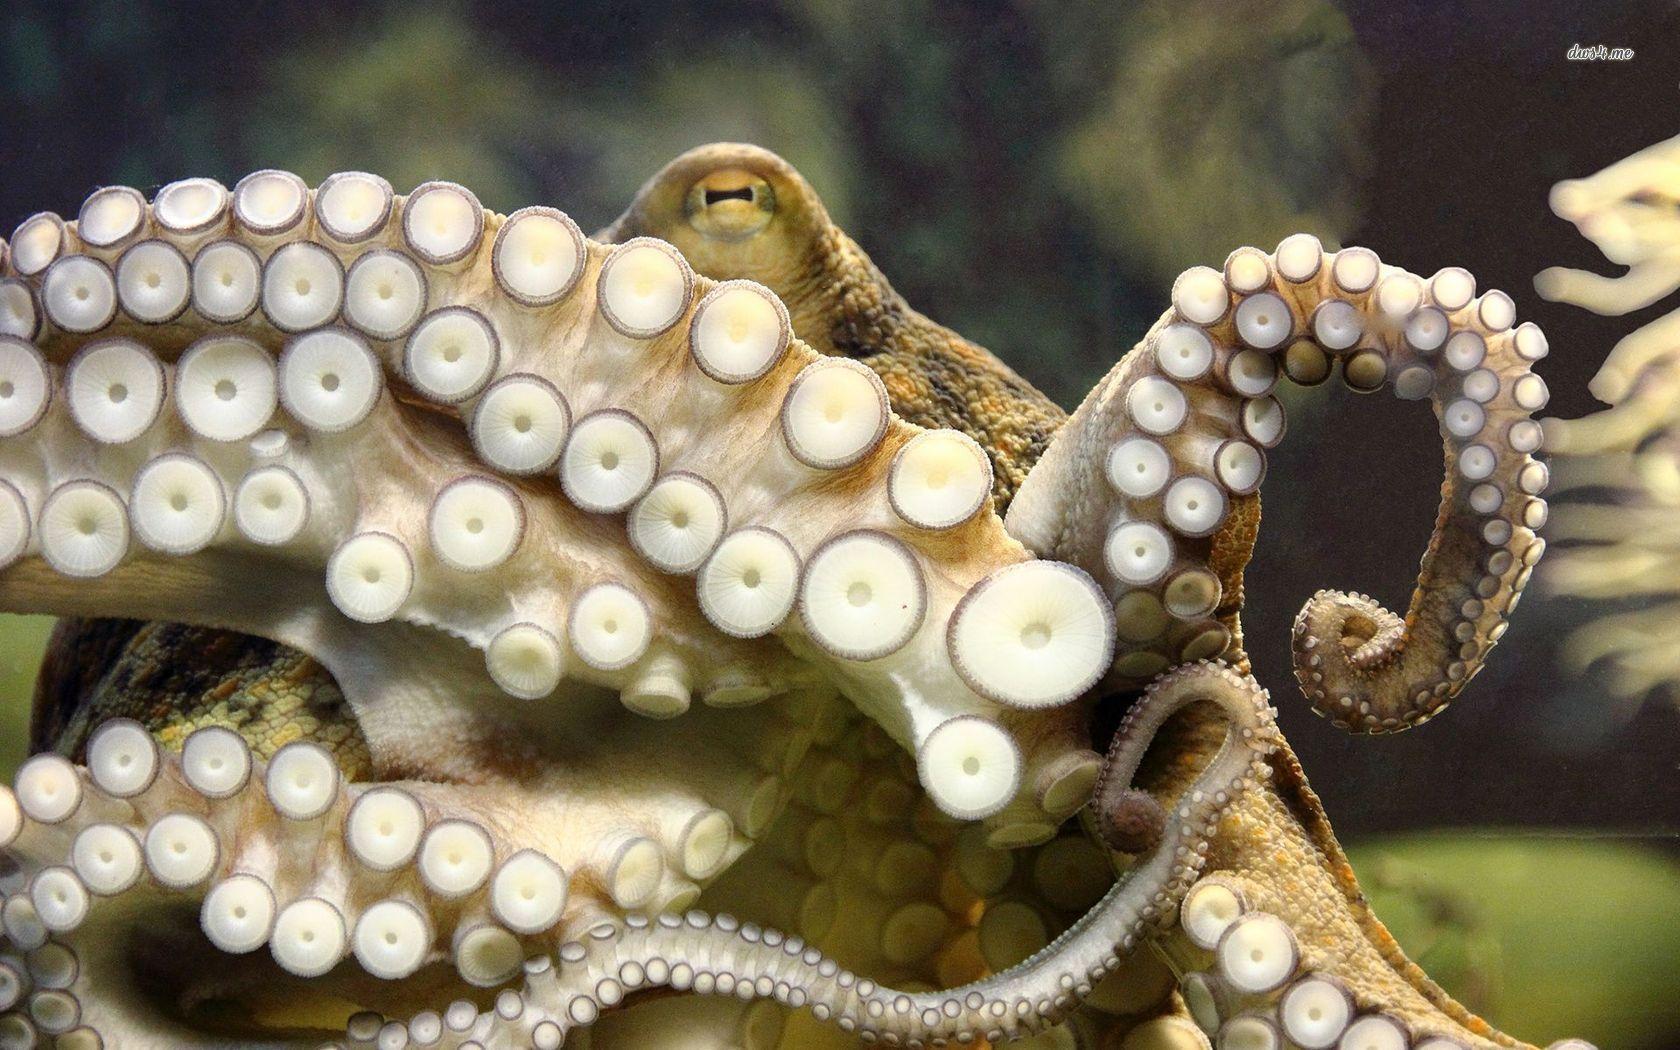 Octopus tentacles octopuses octopi octopodes uc pinterest